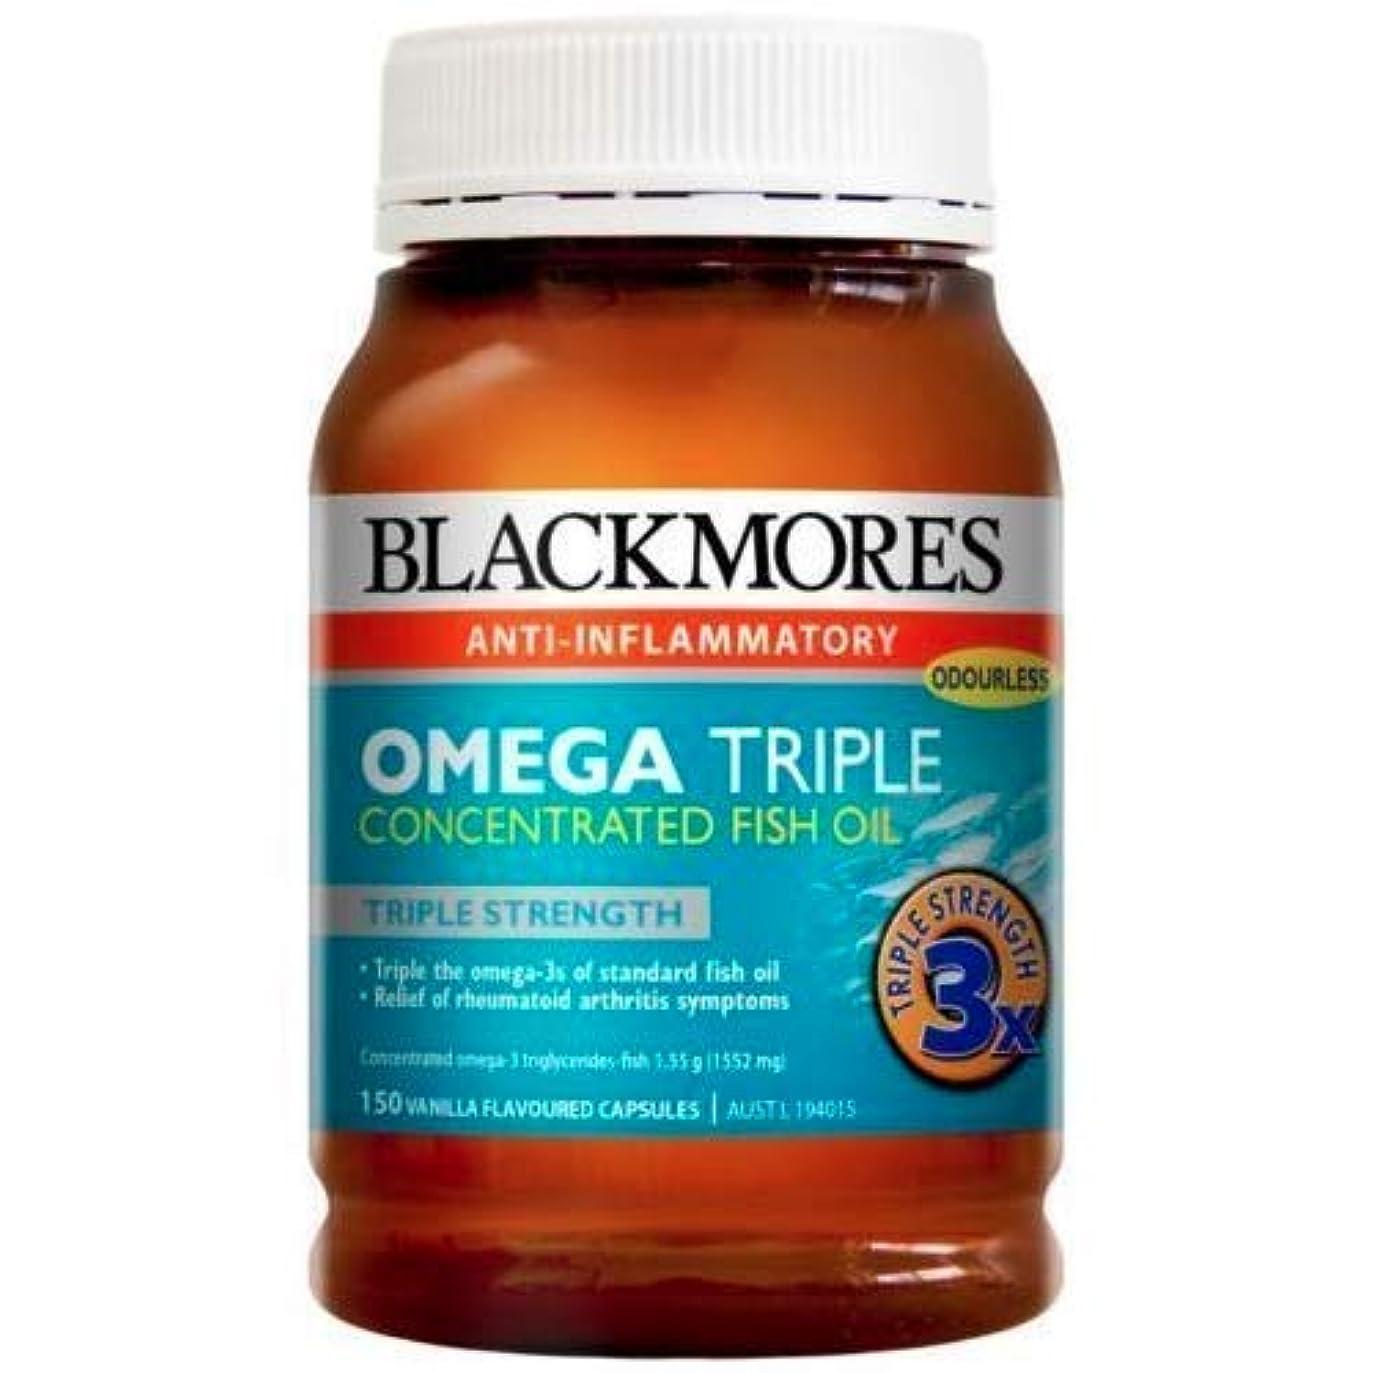 Blackmores オメガトリプル 濃縮フィッシュオイル 150カプセル [豪州直送品] [並行輸入品]